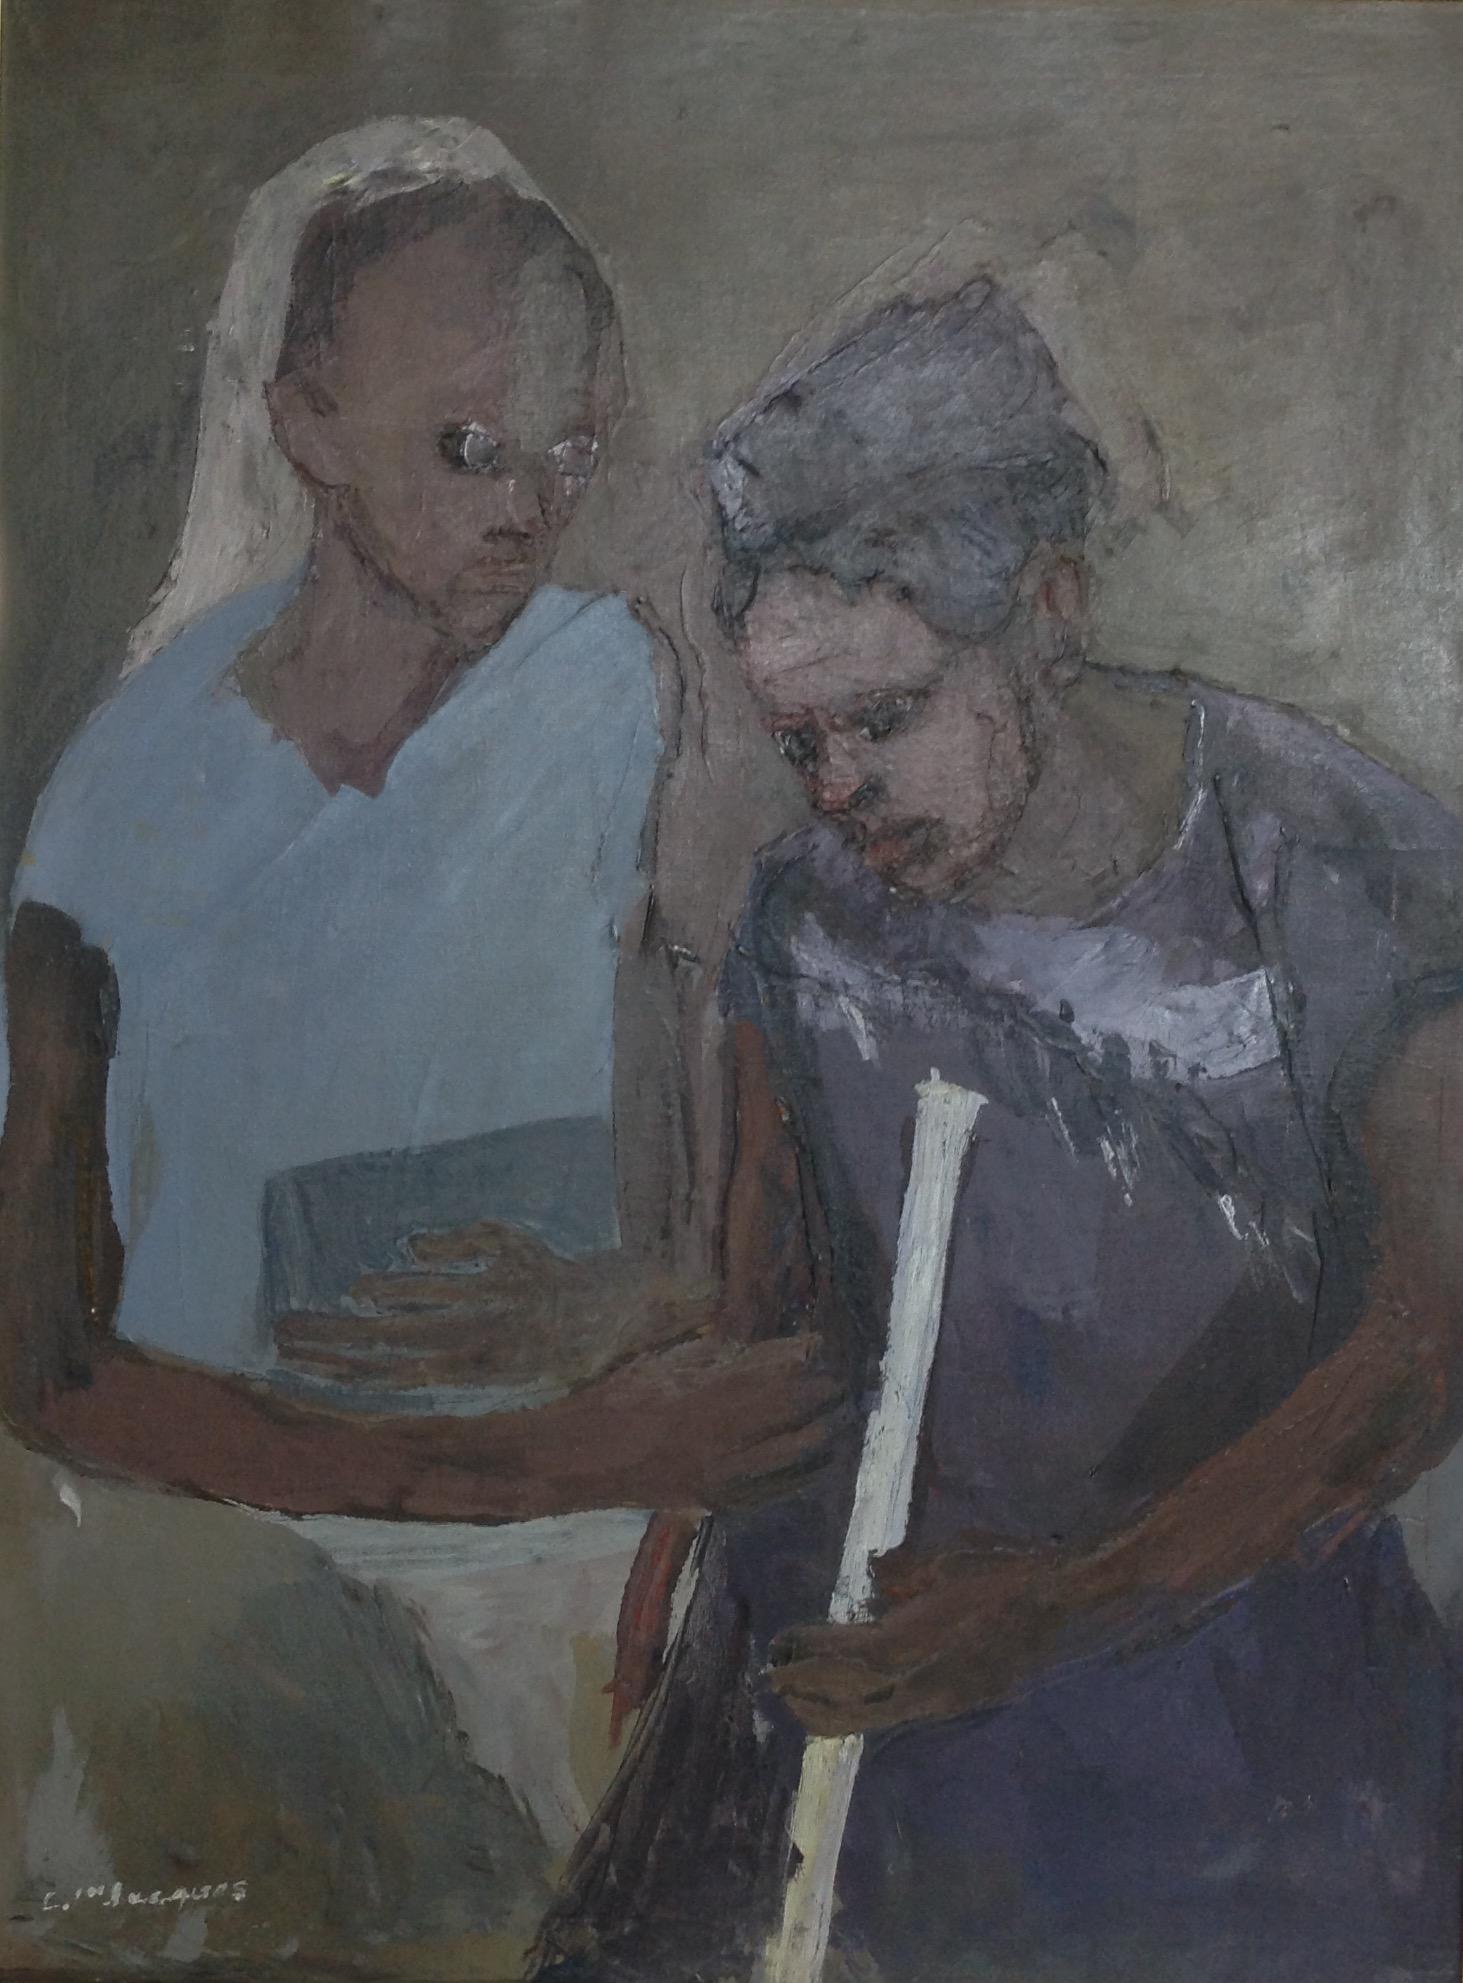 Jn Jacques Carlo 24X32 #106-3-96 canvas